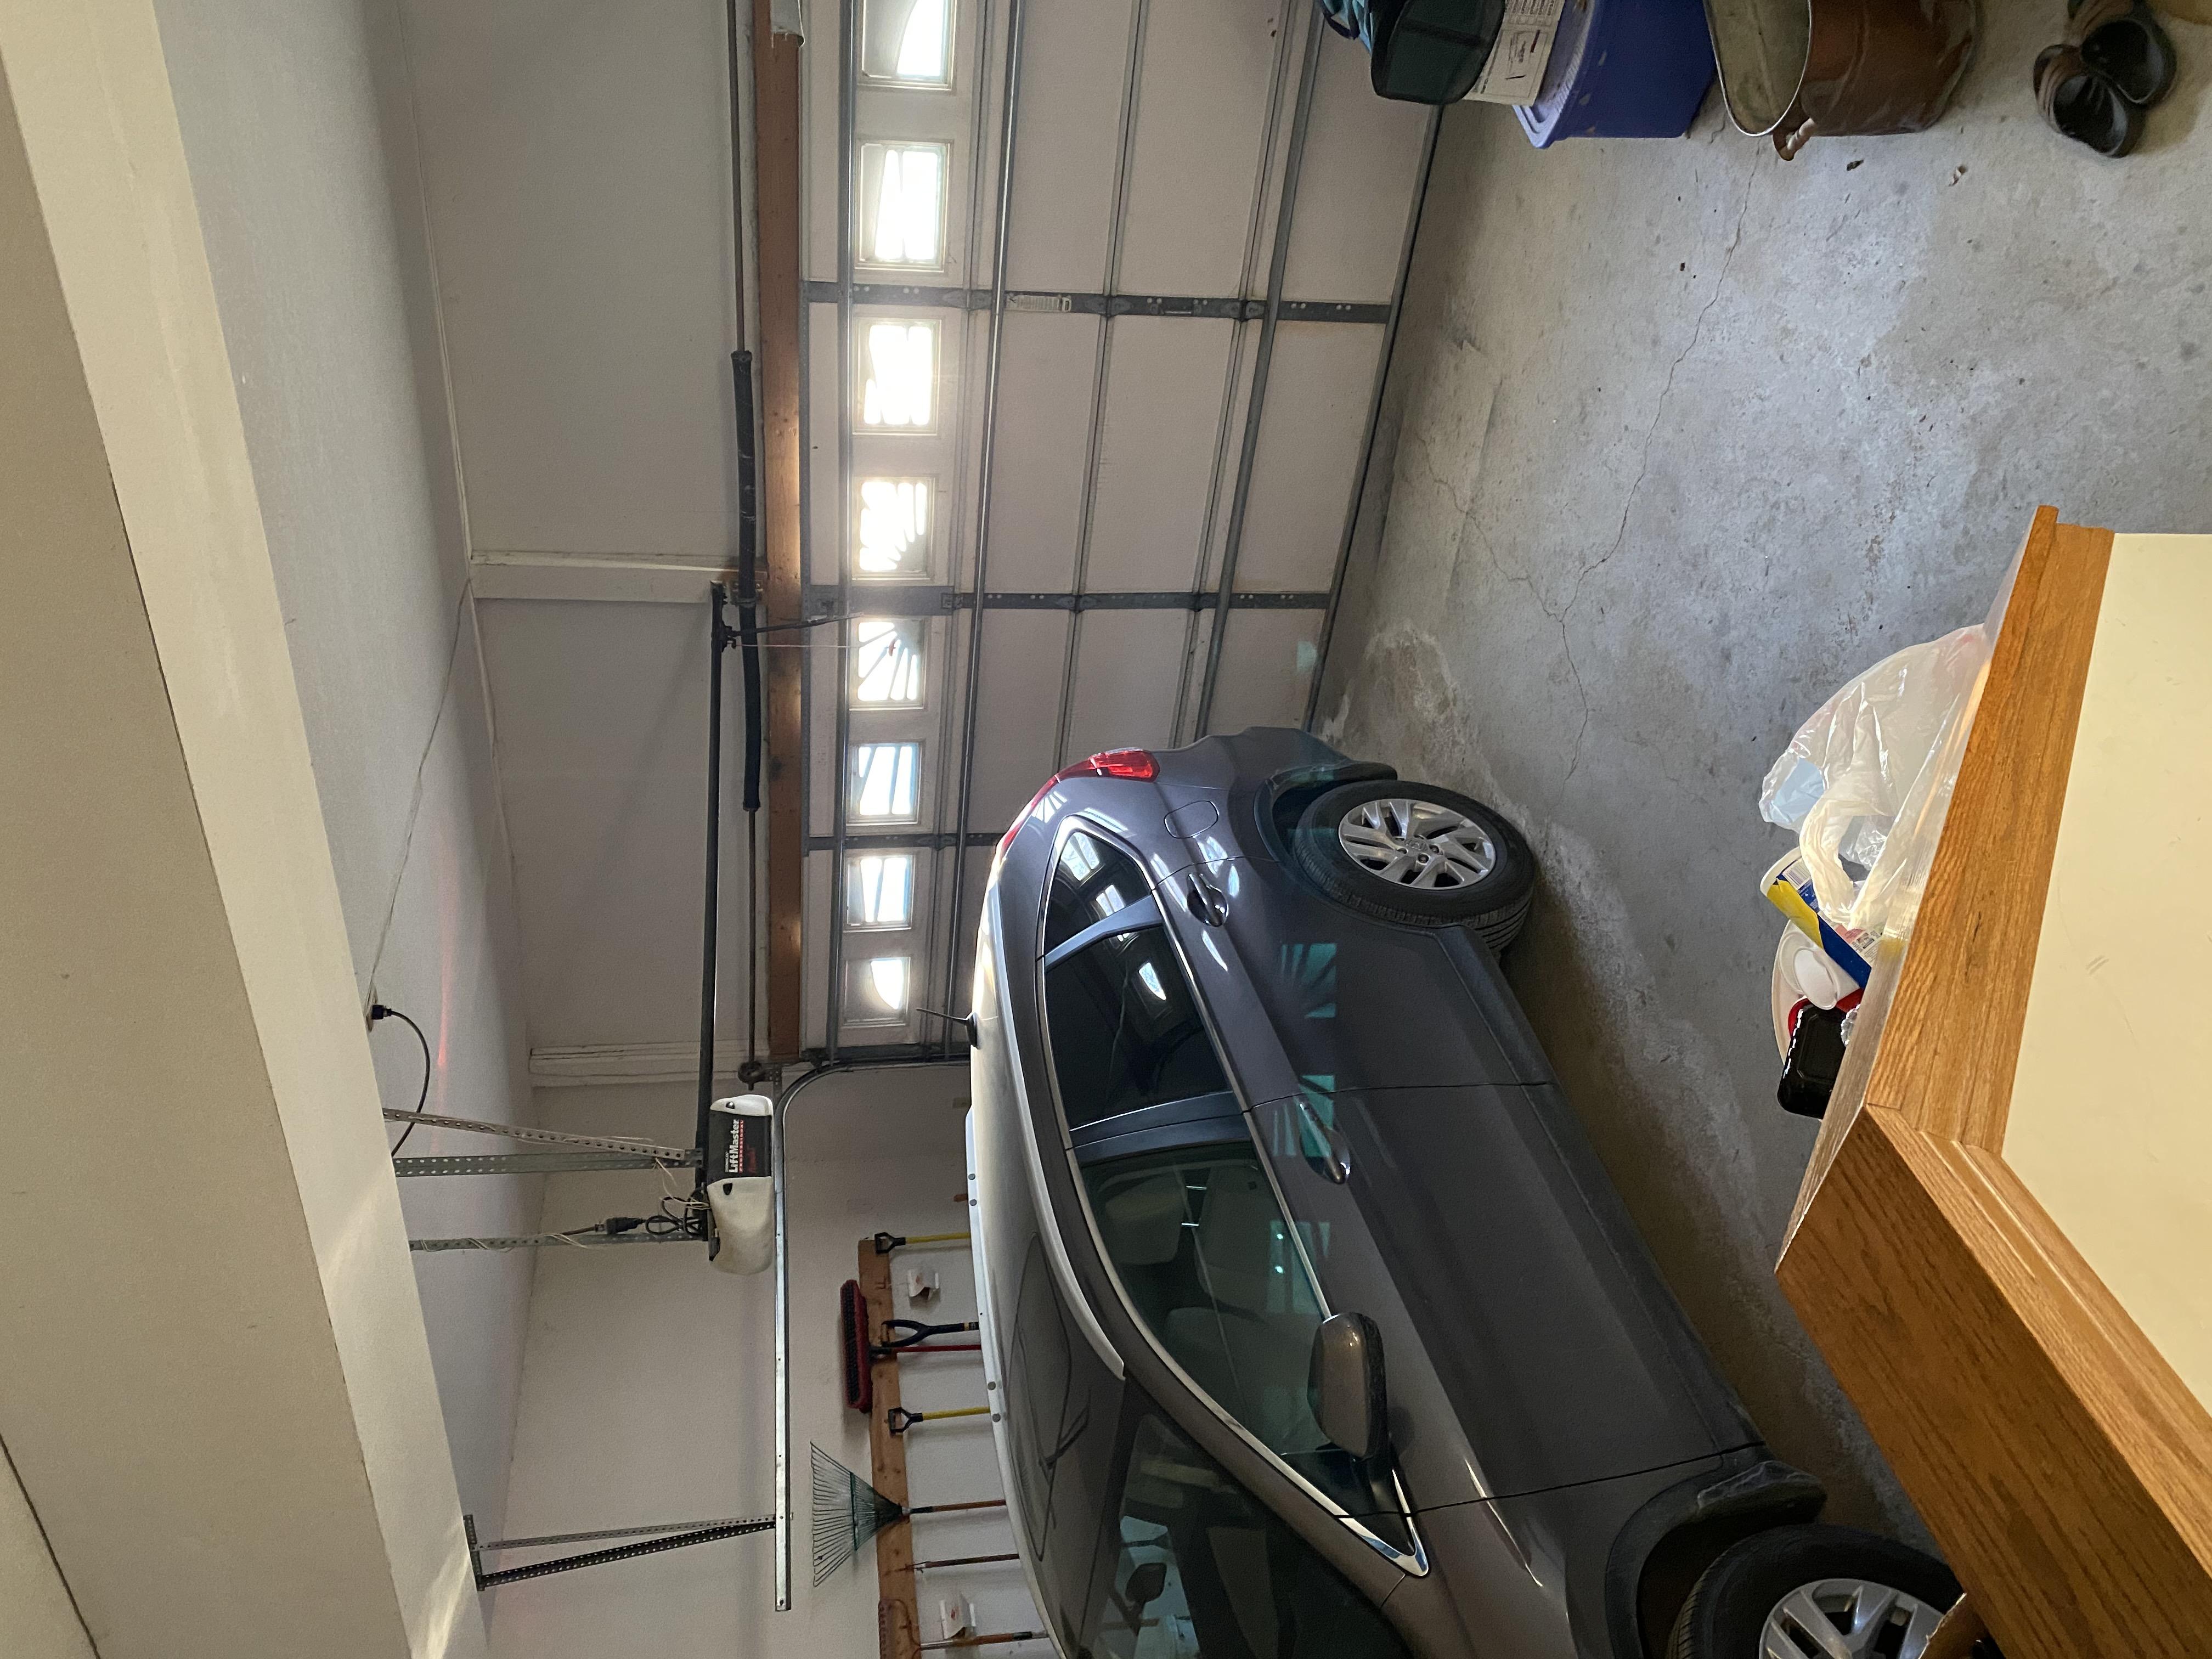 2058 HIllside Ave Mondamin garage